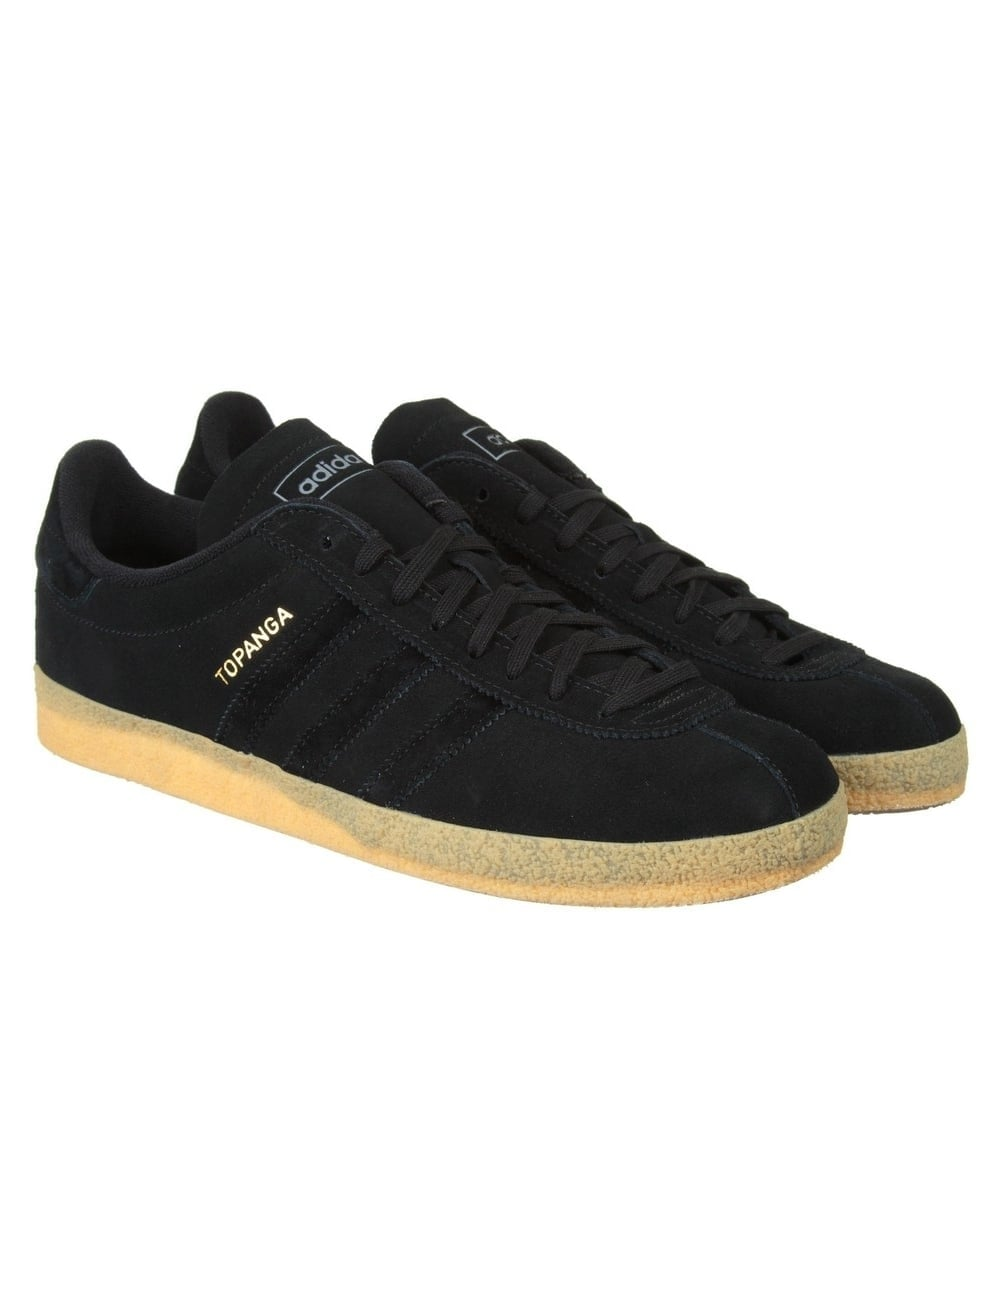 cheaper f59db 2ebf7 Adidas Originals Topanga Shoes - Collegiate Black Gum